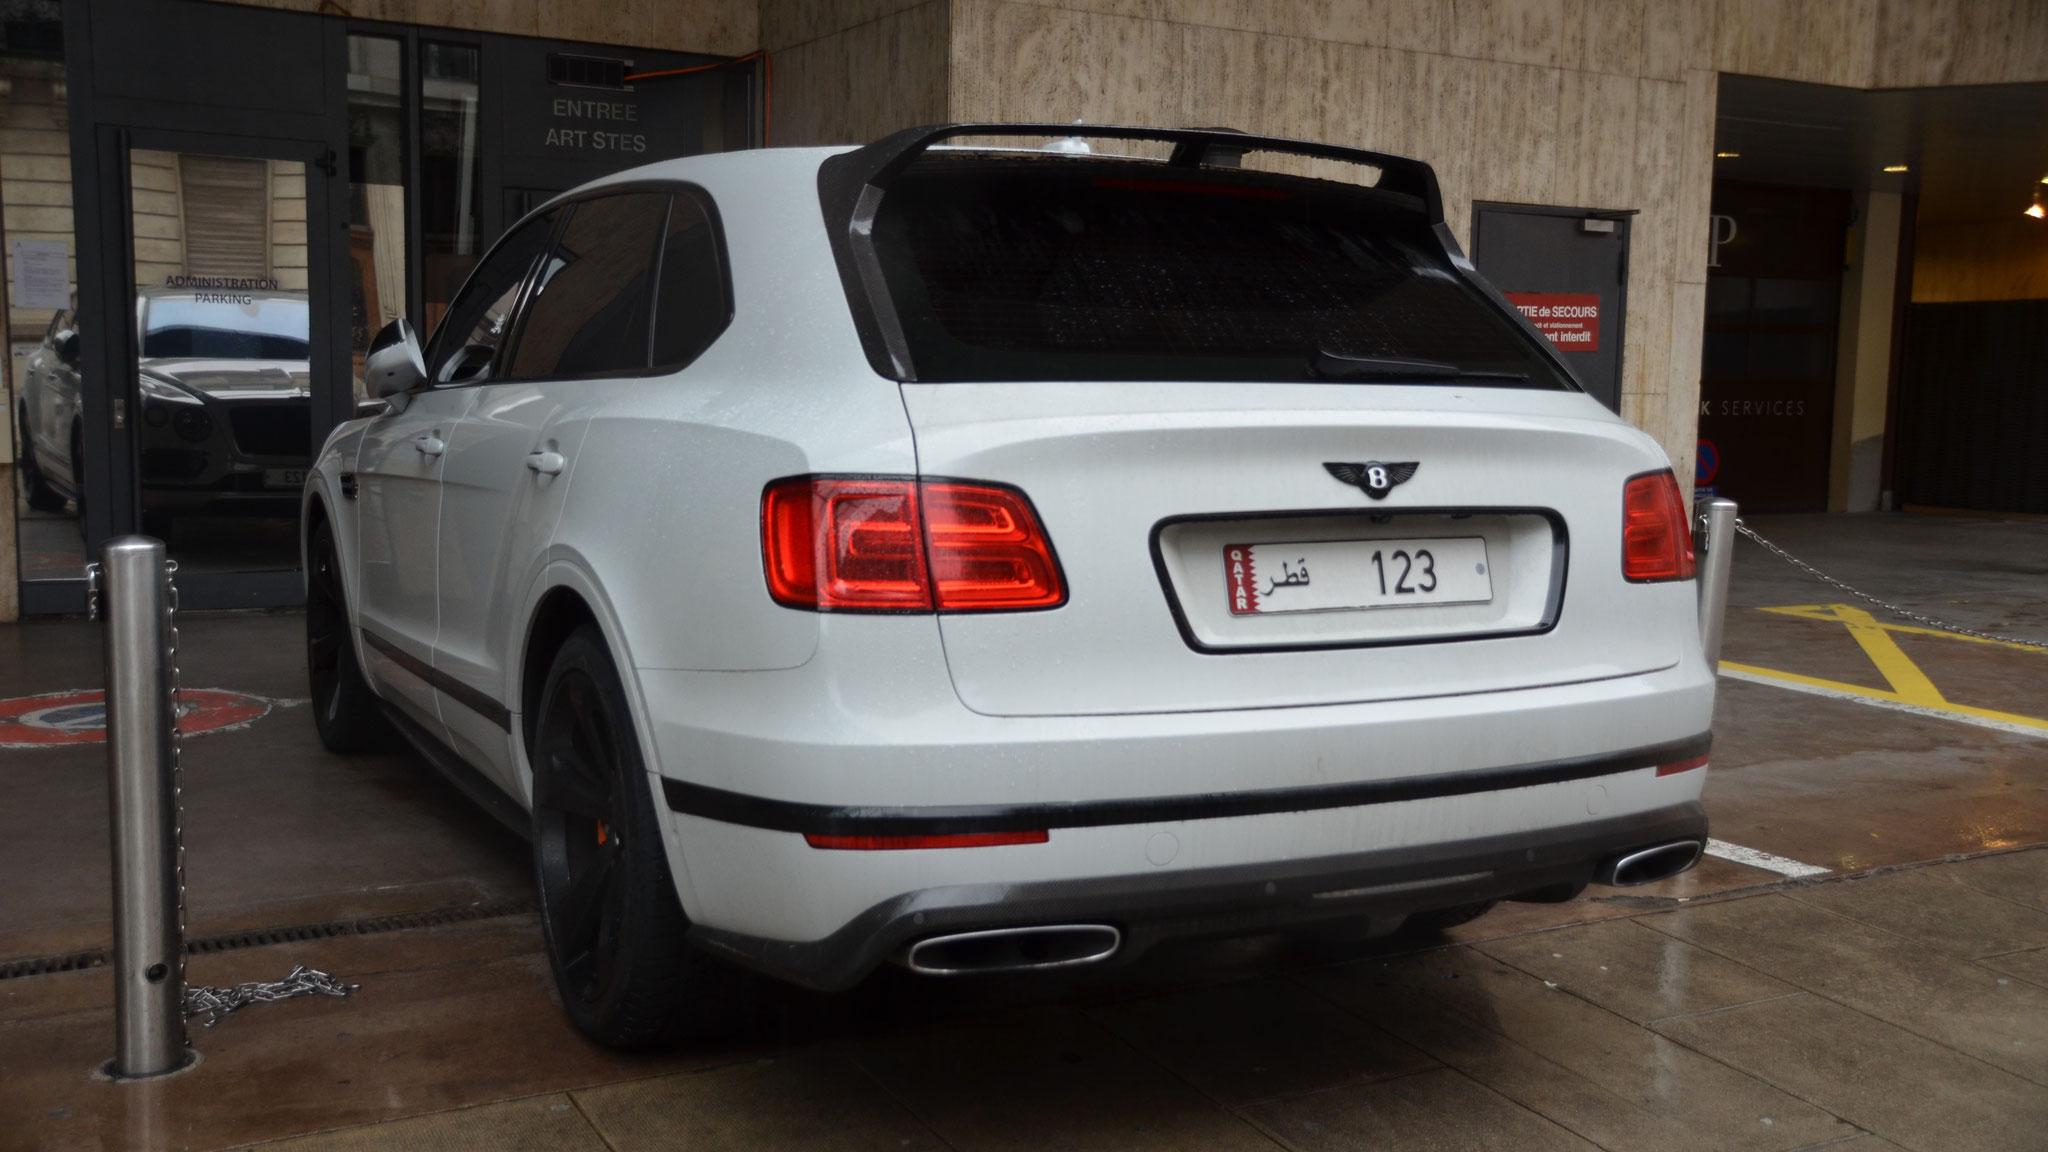 Bentley Bentayga - 123 (QAT)